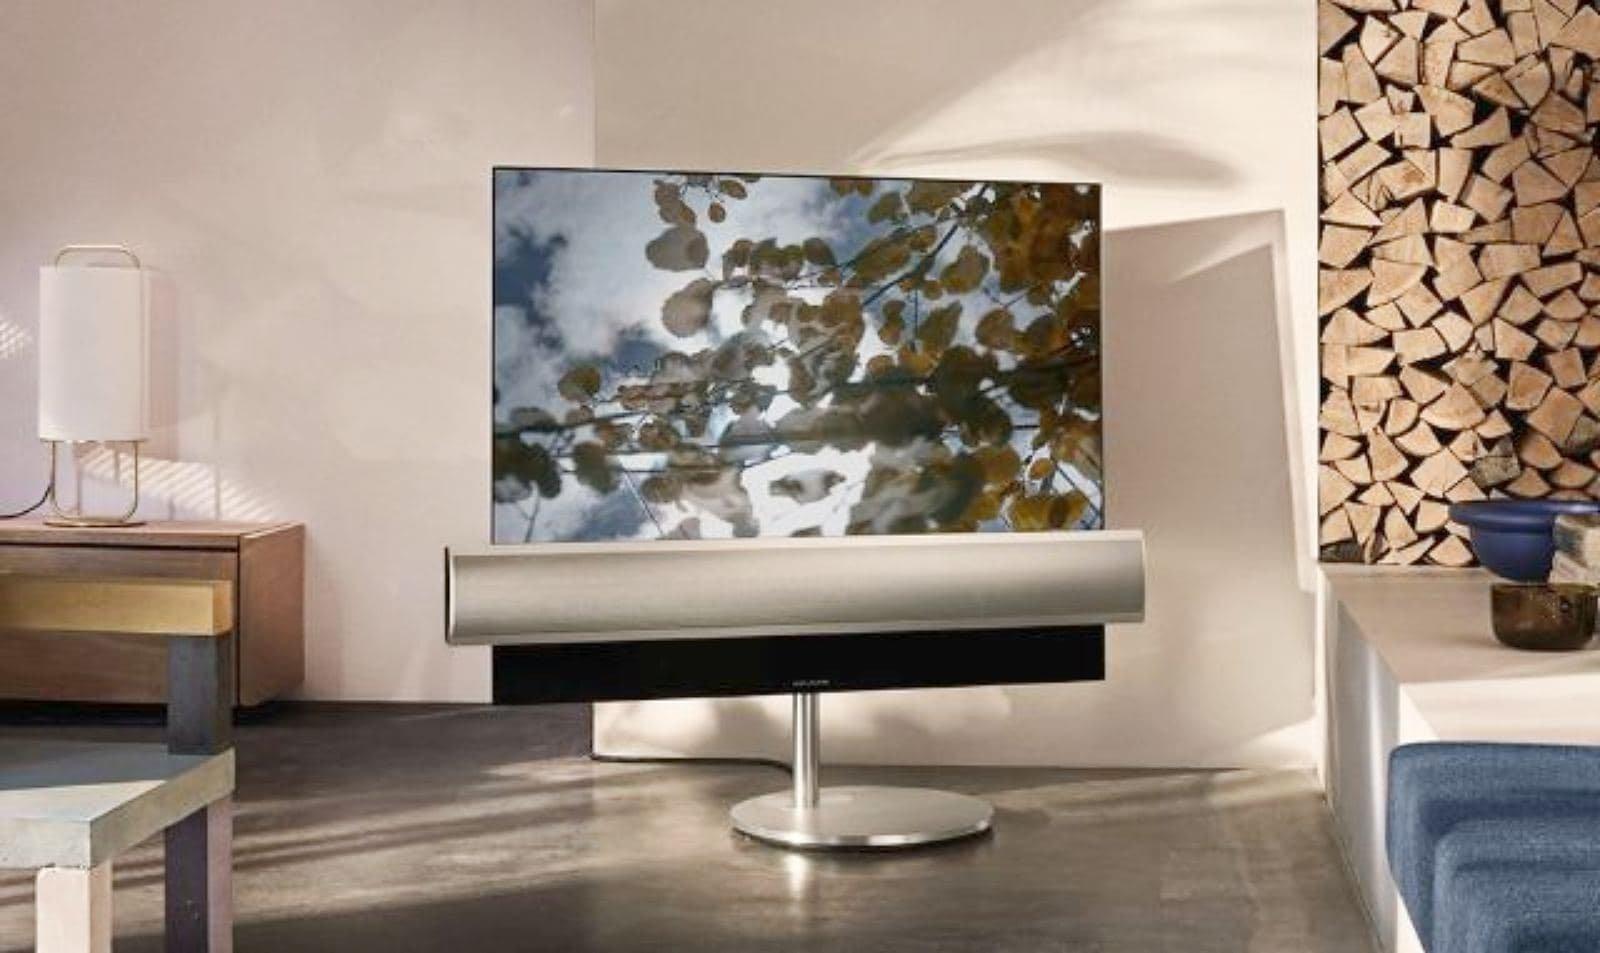 Mejores televisores 4K 55 pulgadas